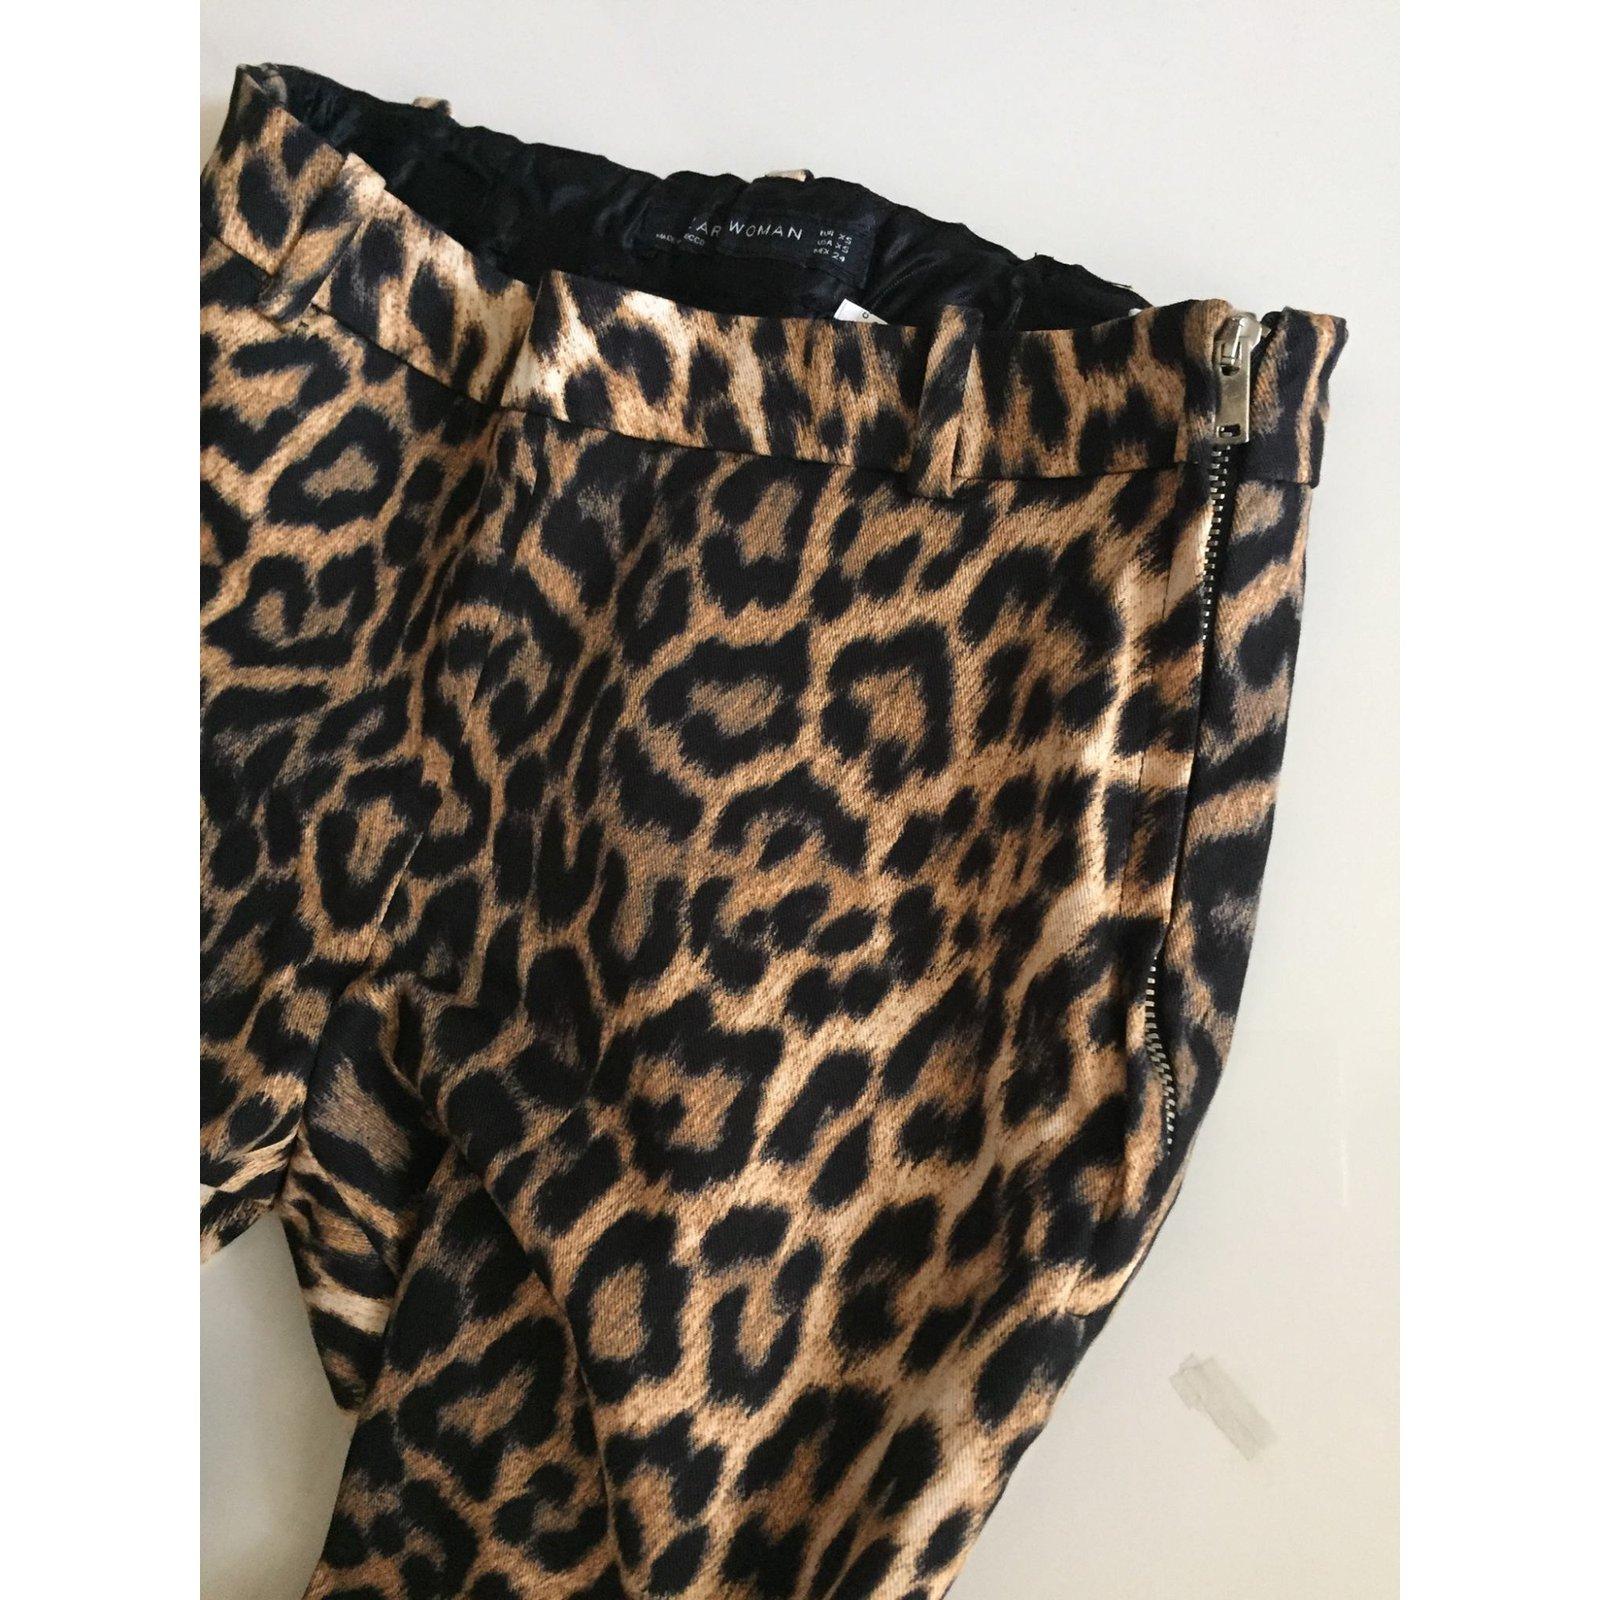 ZARA Bottes stretch motif léopard léopard léopard imprimé